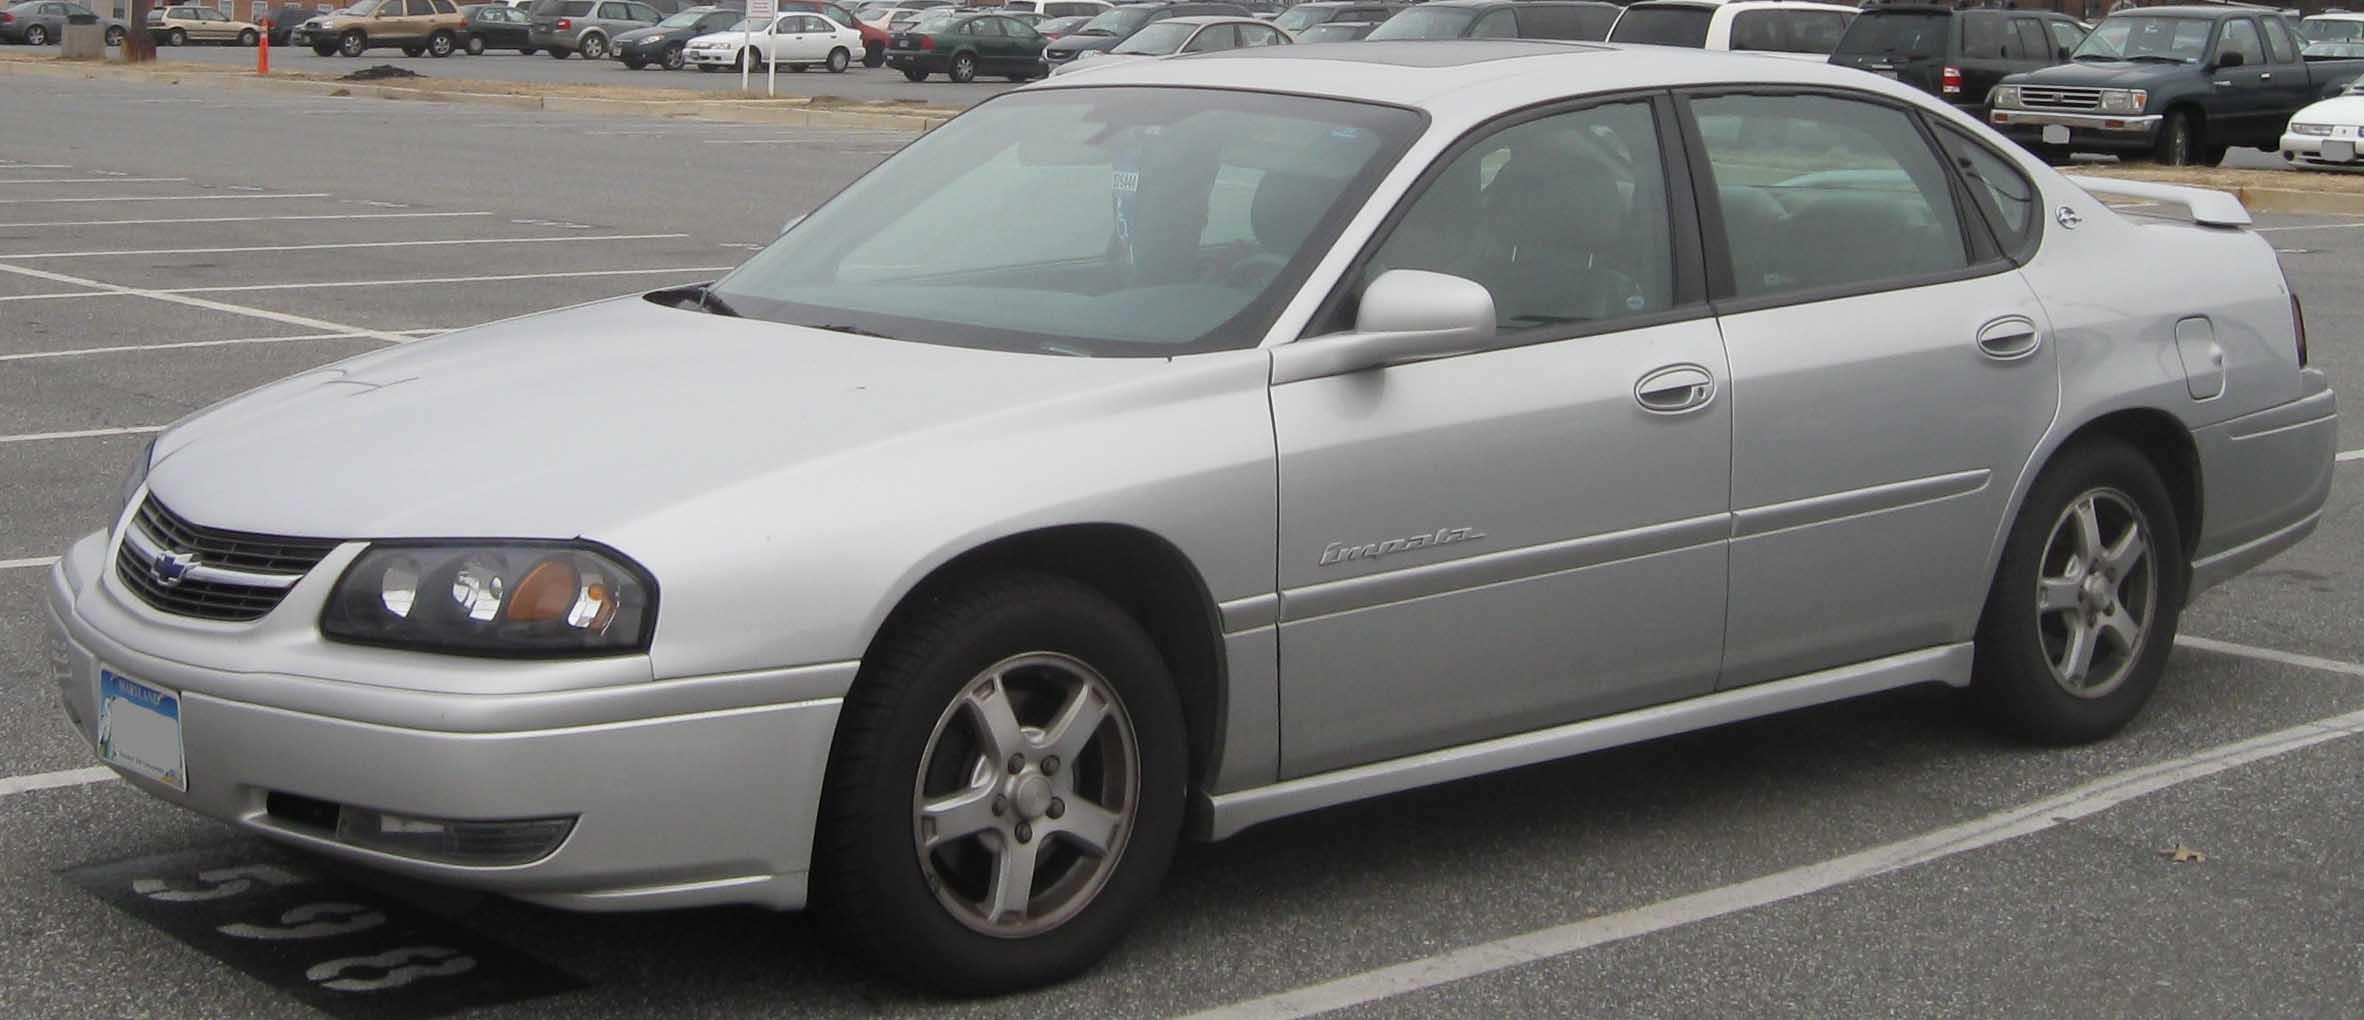 Chevrolet Impala – wolna encyklopedia